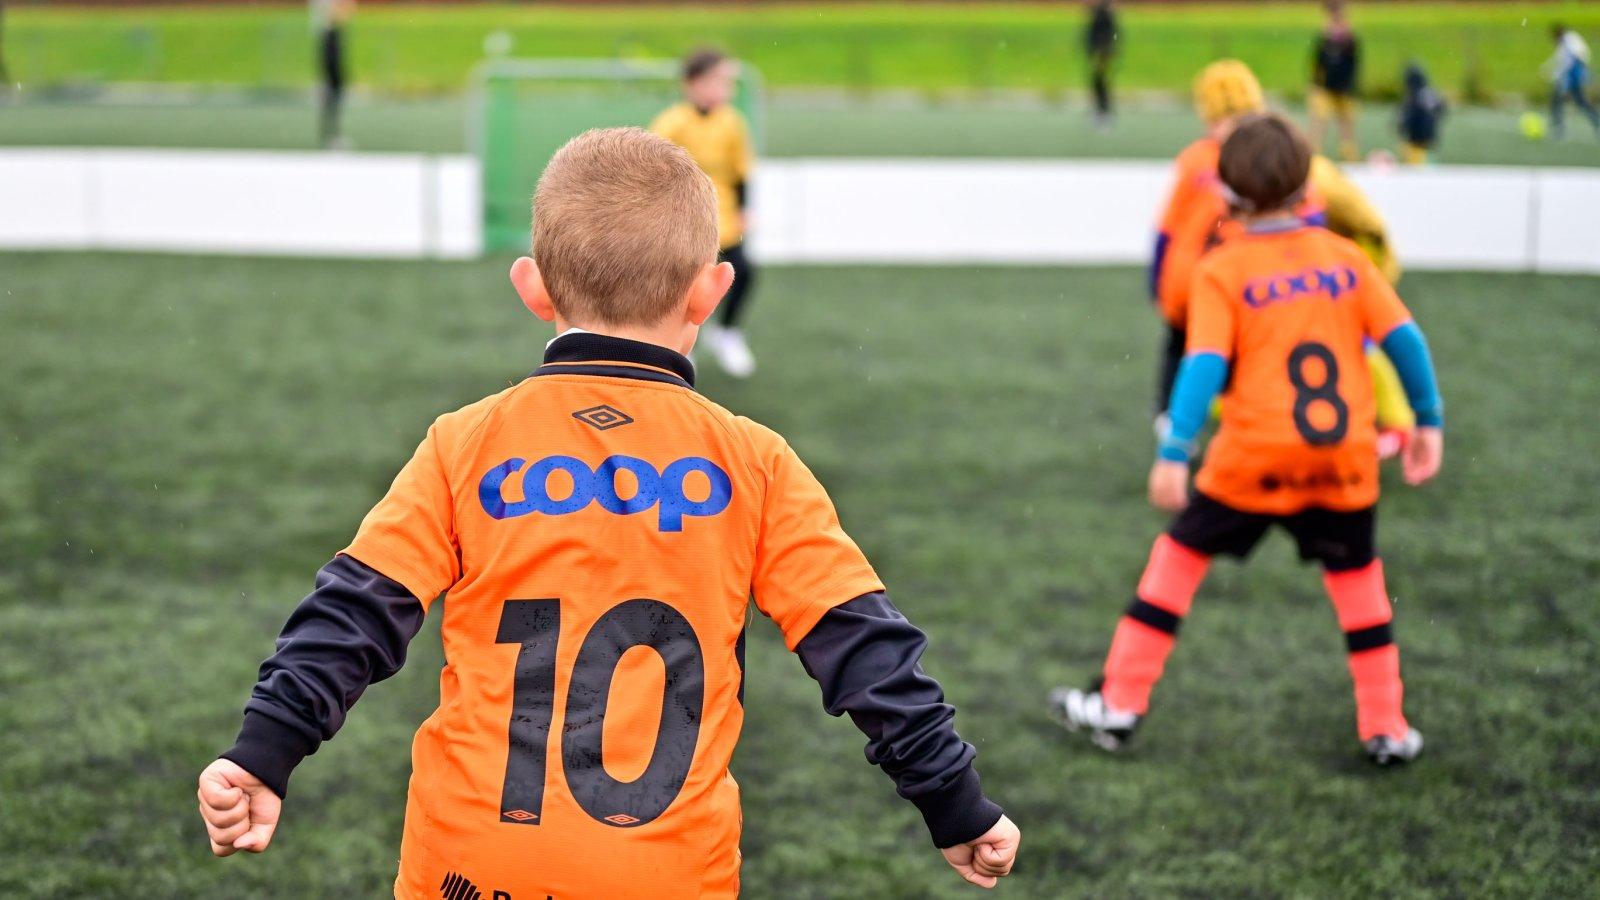 Barne - og ungdomsavdeling. Aspmyra Kunstgress. Fanzone. Fotballspilling. Fanzone 2019.